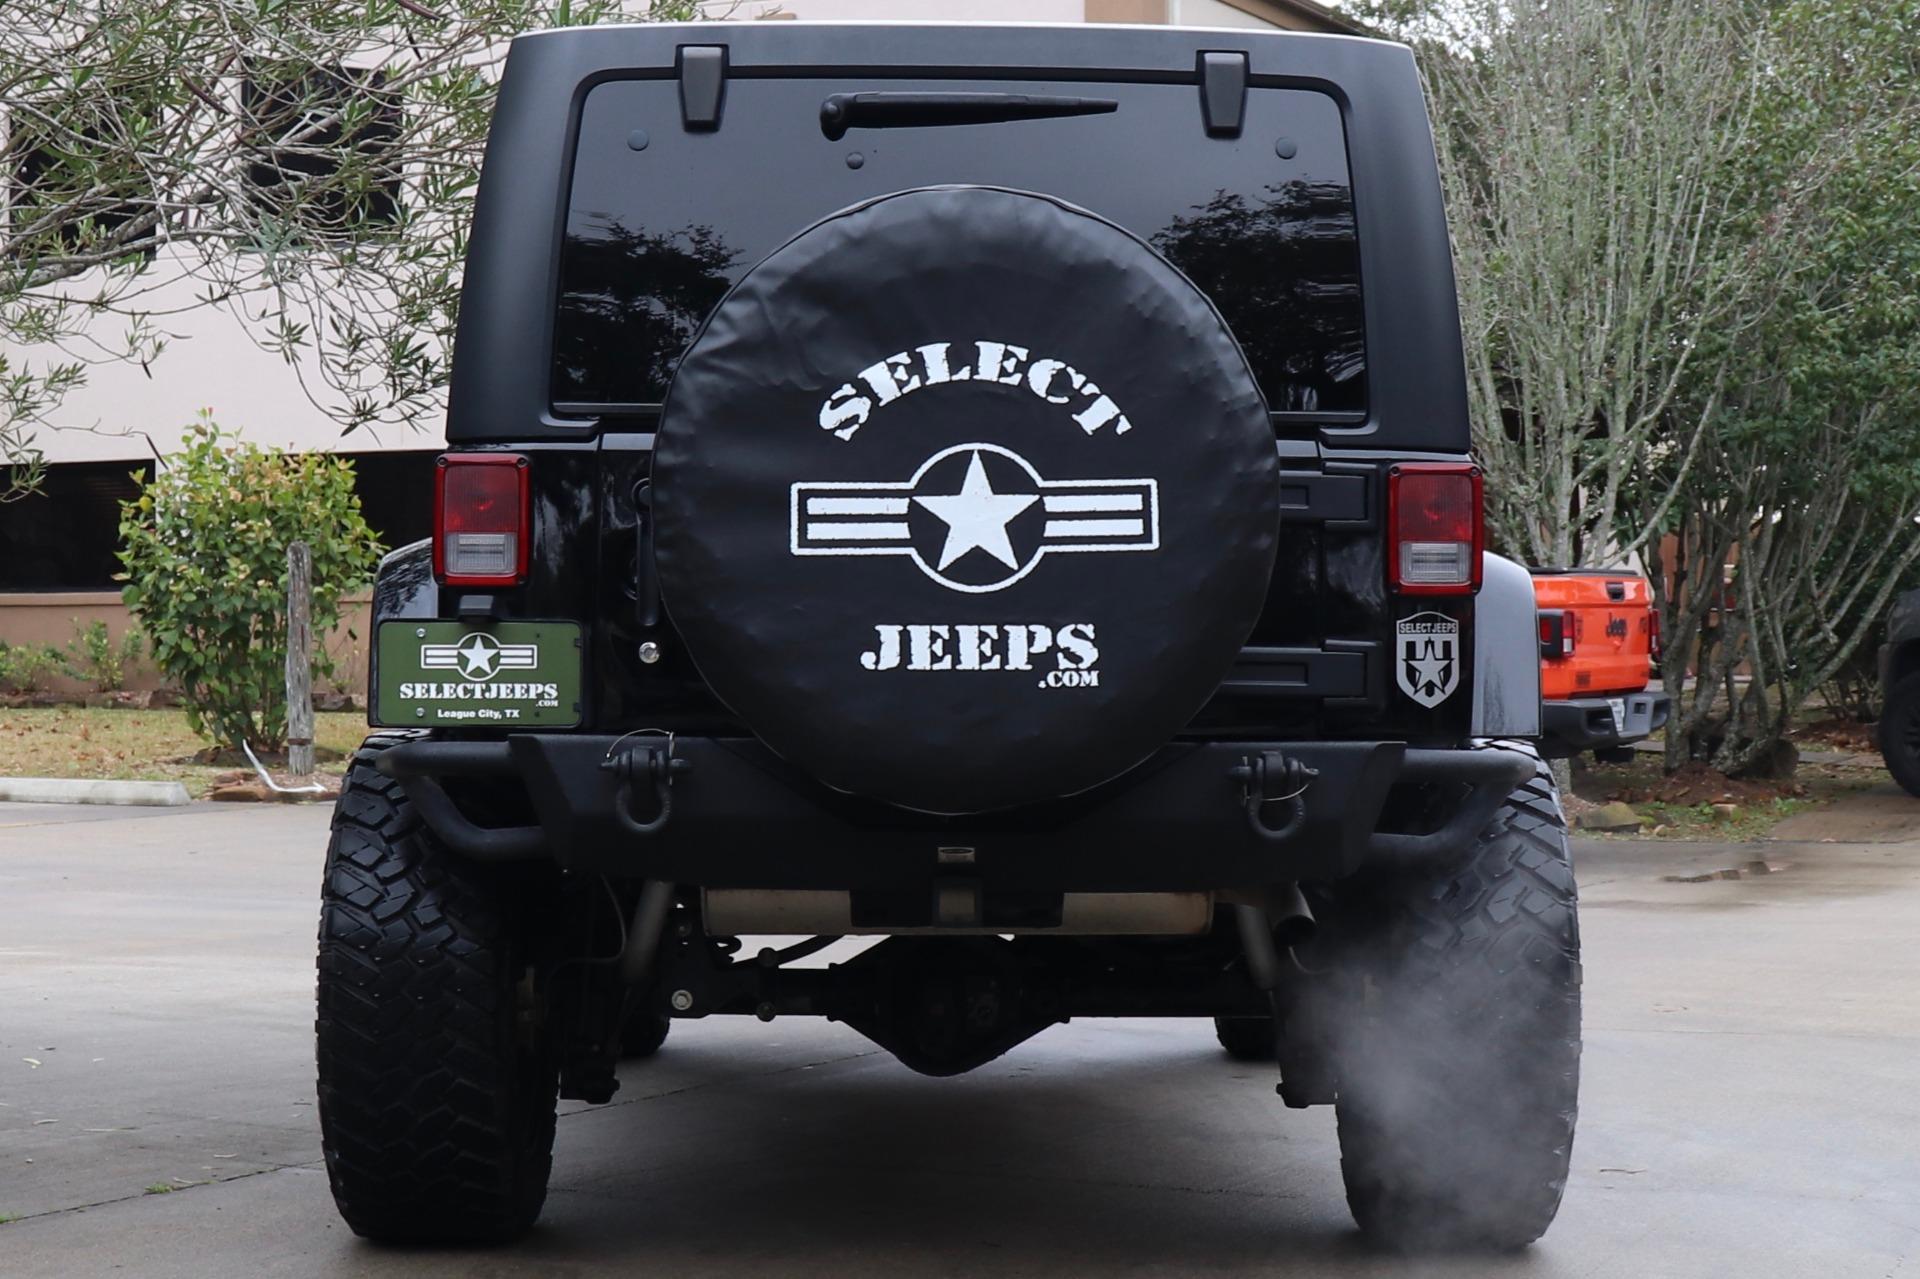 Used-2015-Jeep-Wrangler-Unlimited-Sahara